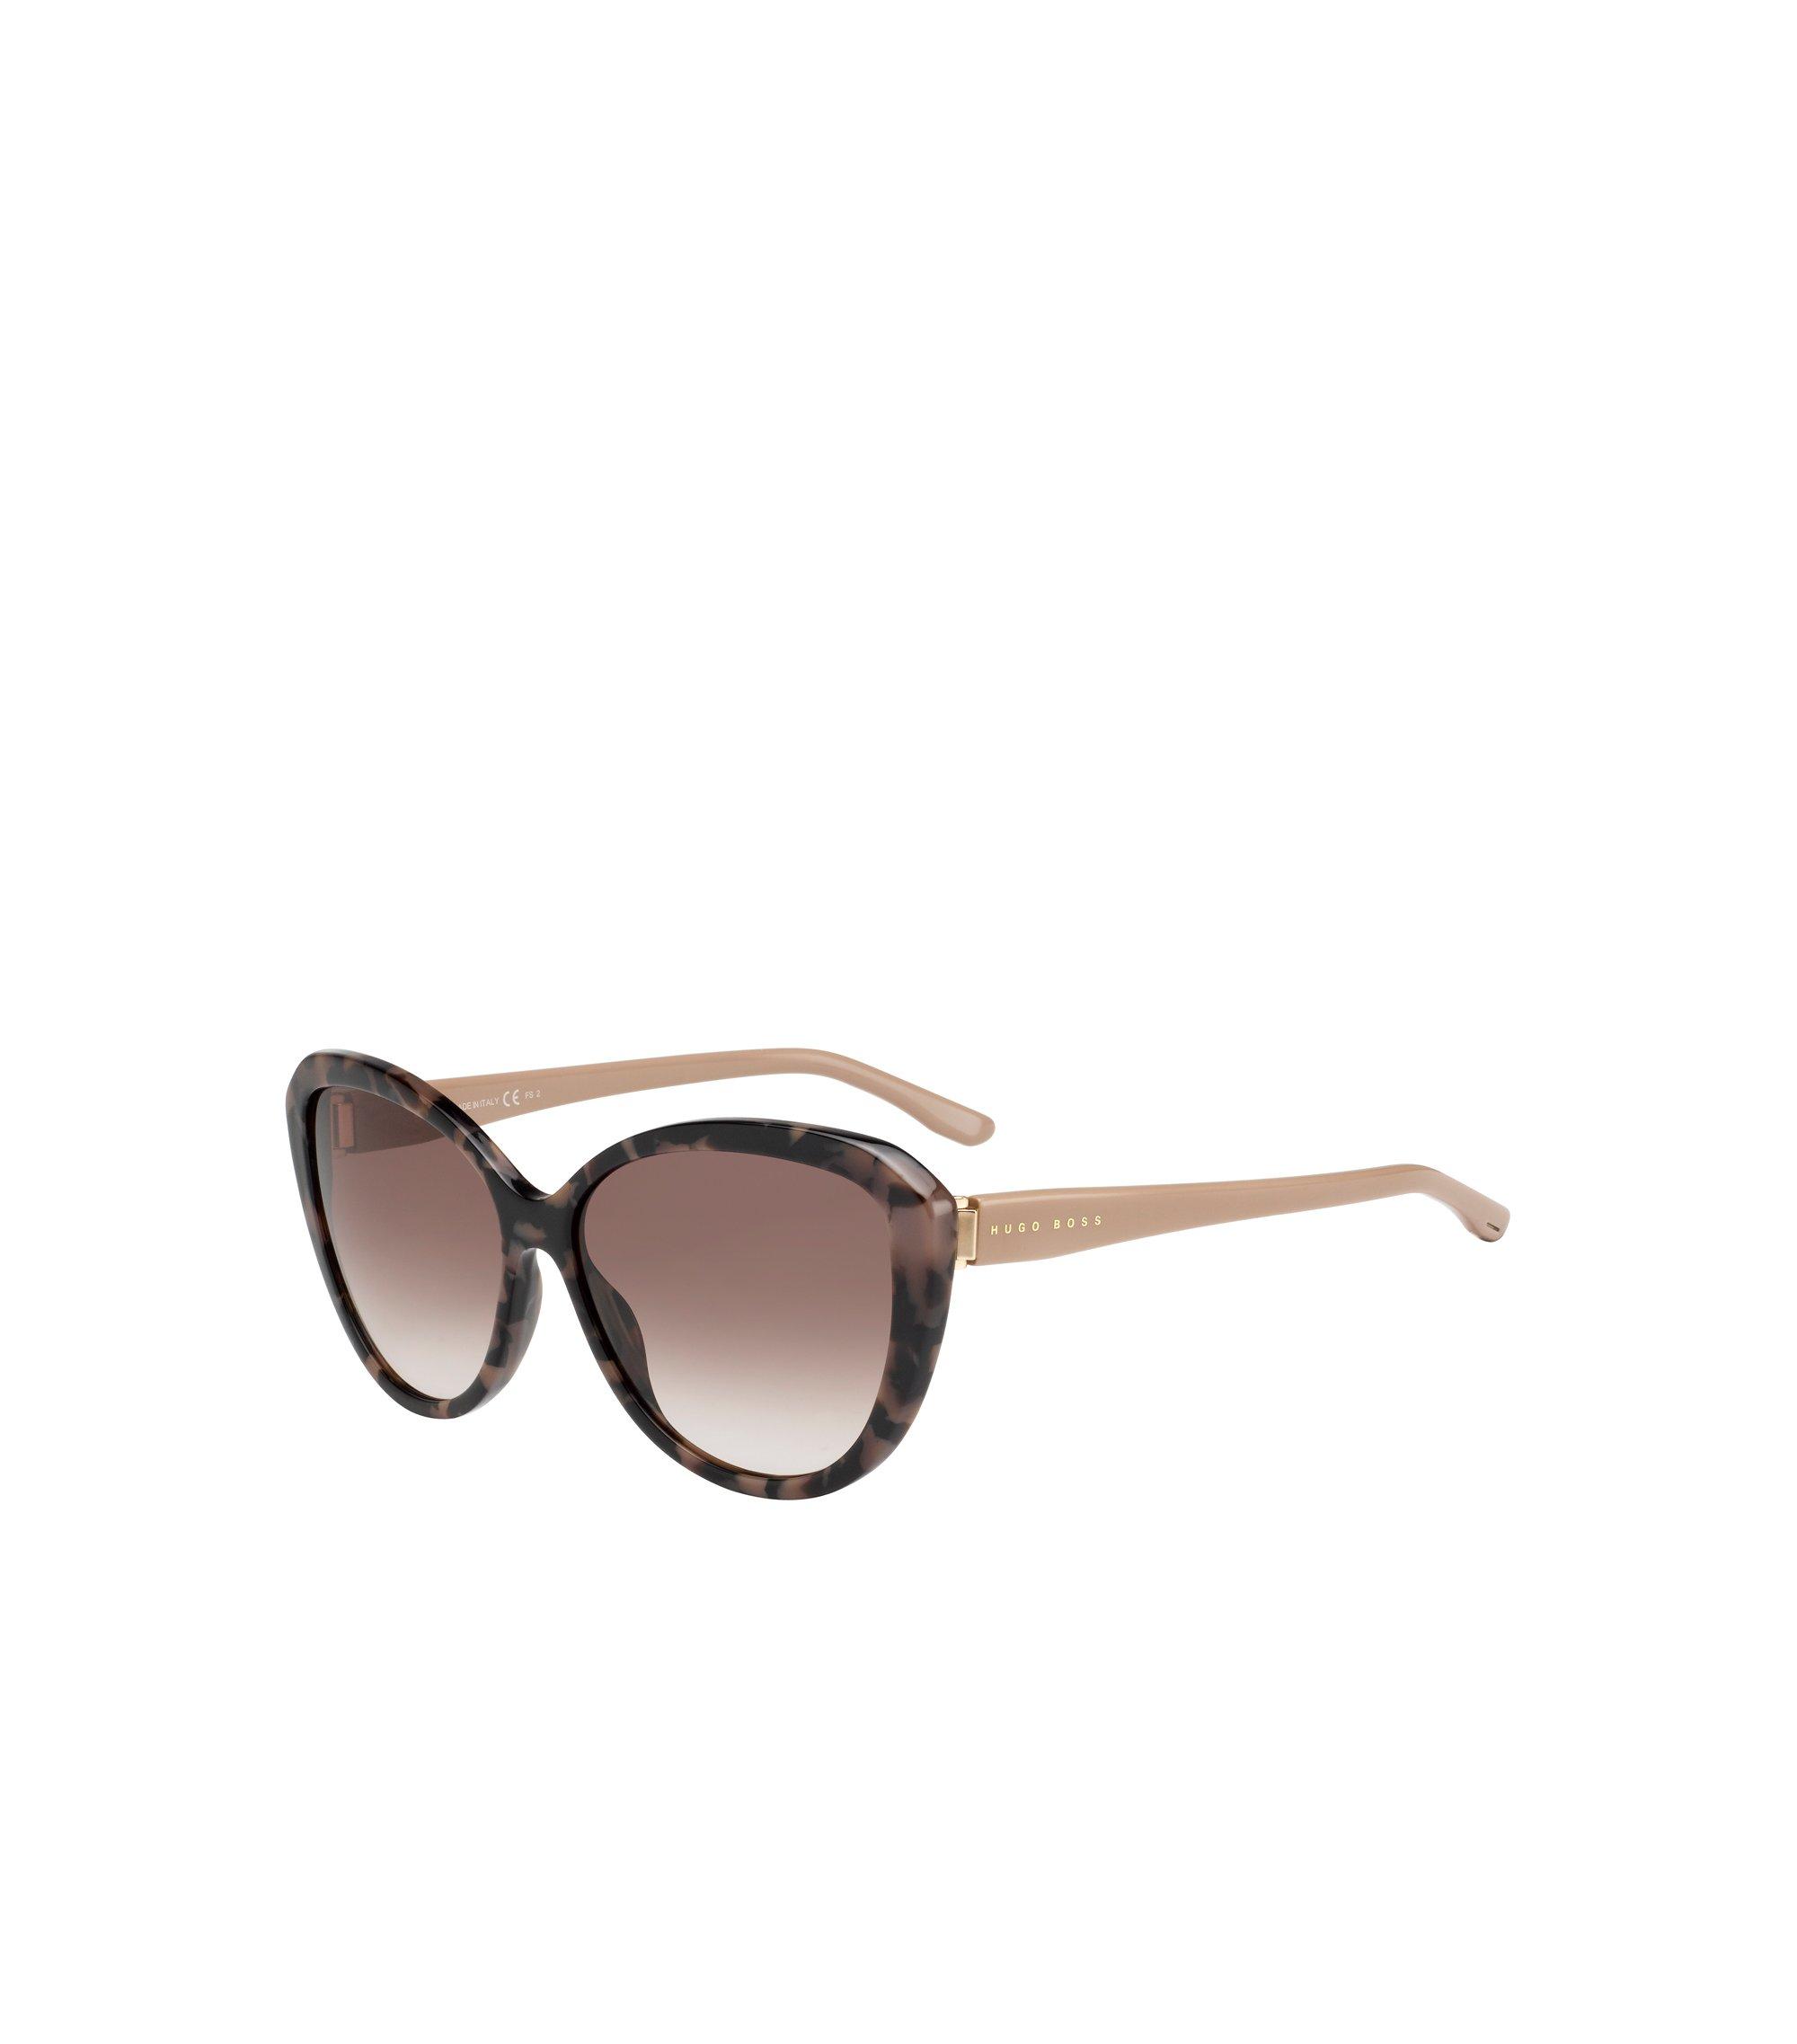 Gradient Lens Acetate Sunglasses | BOSS 0845S, Assorted-Pre-Pack